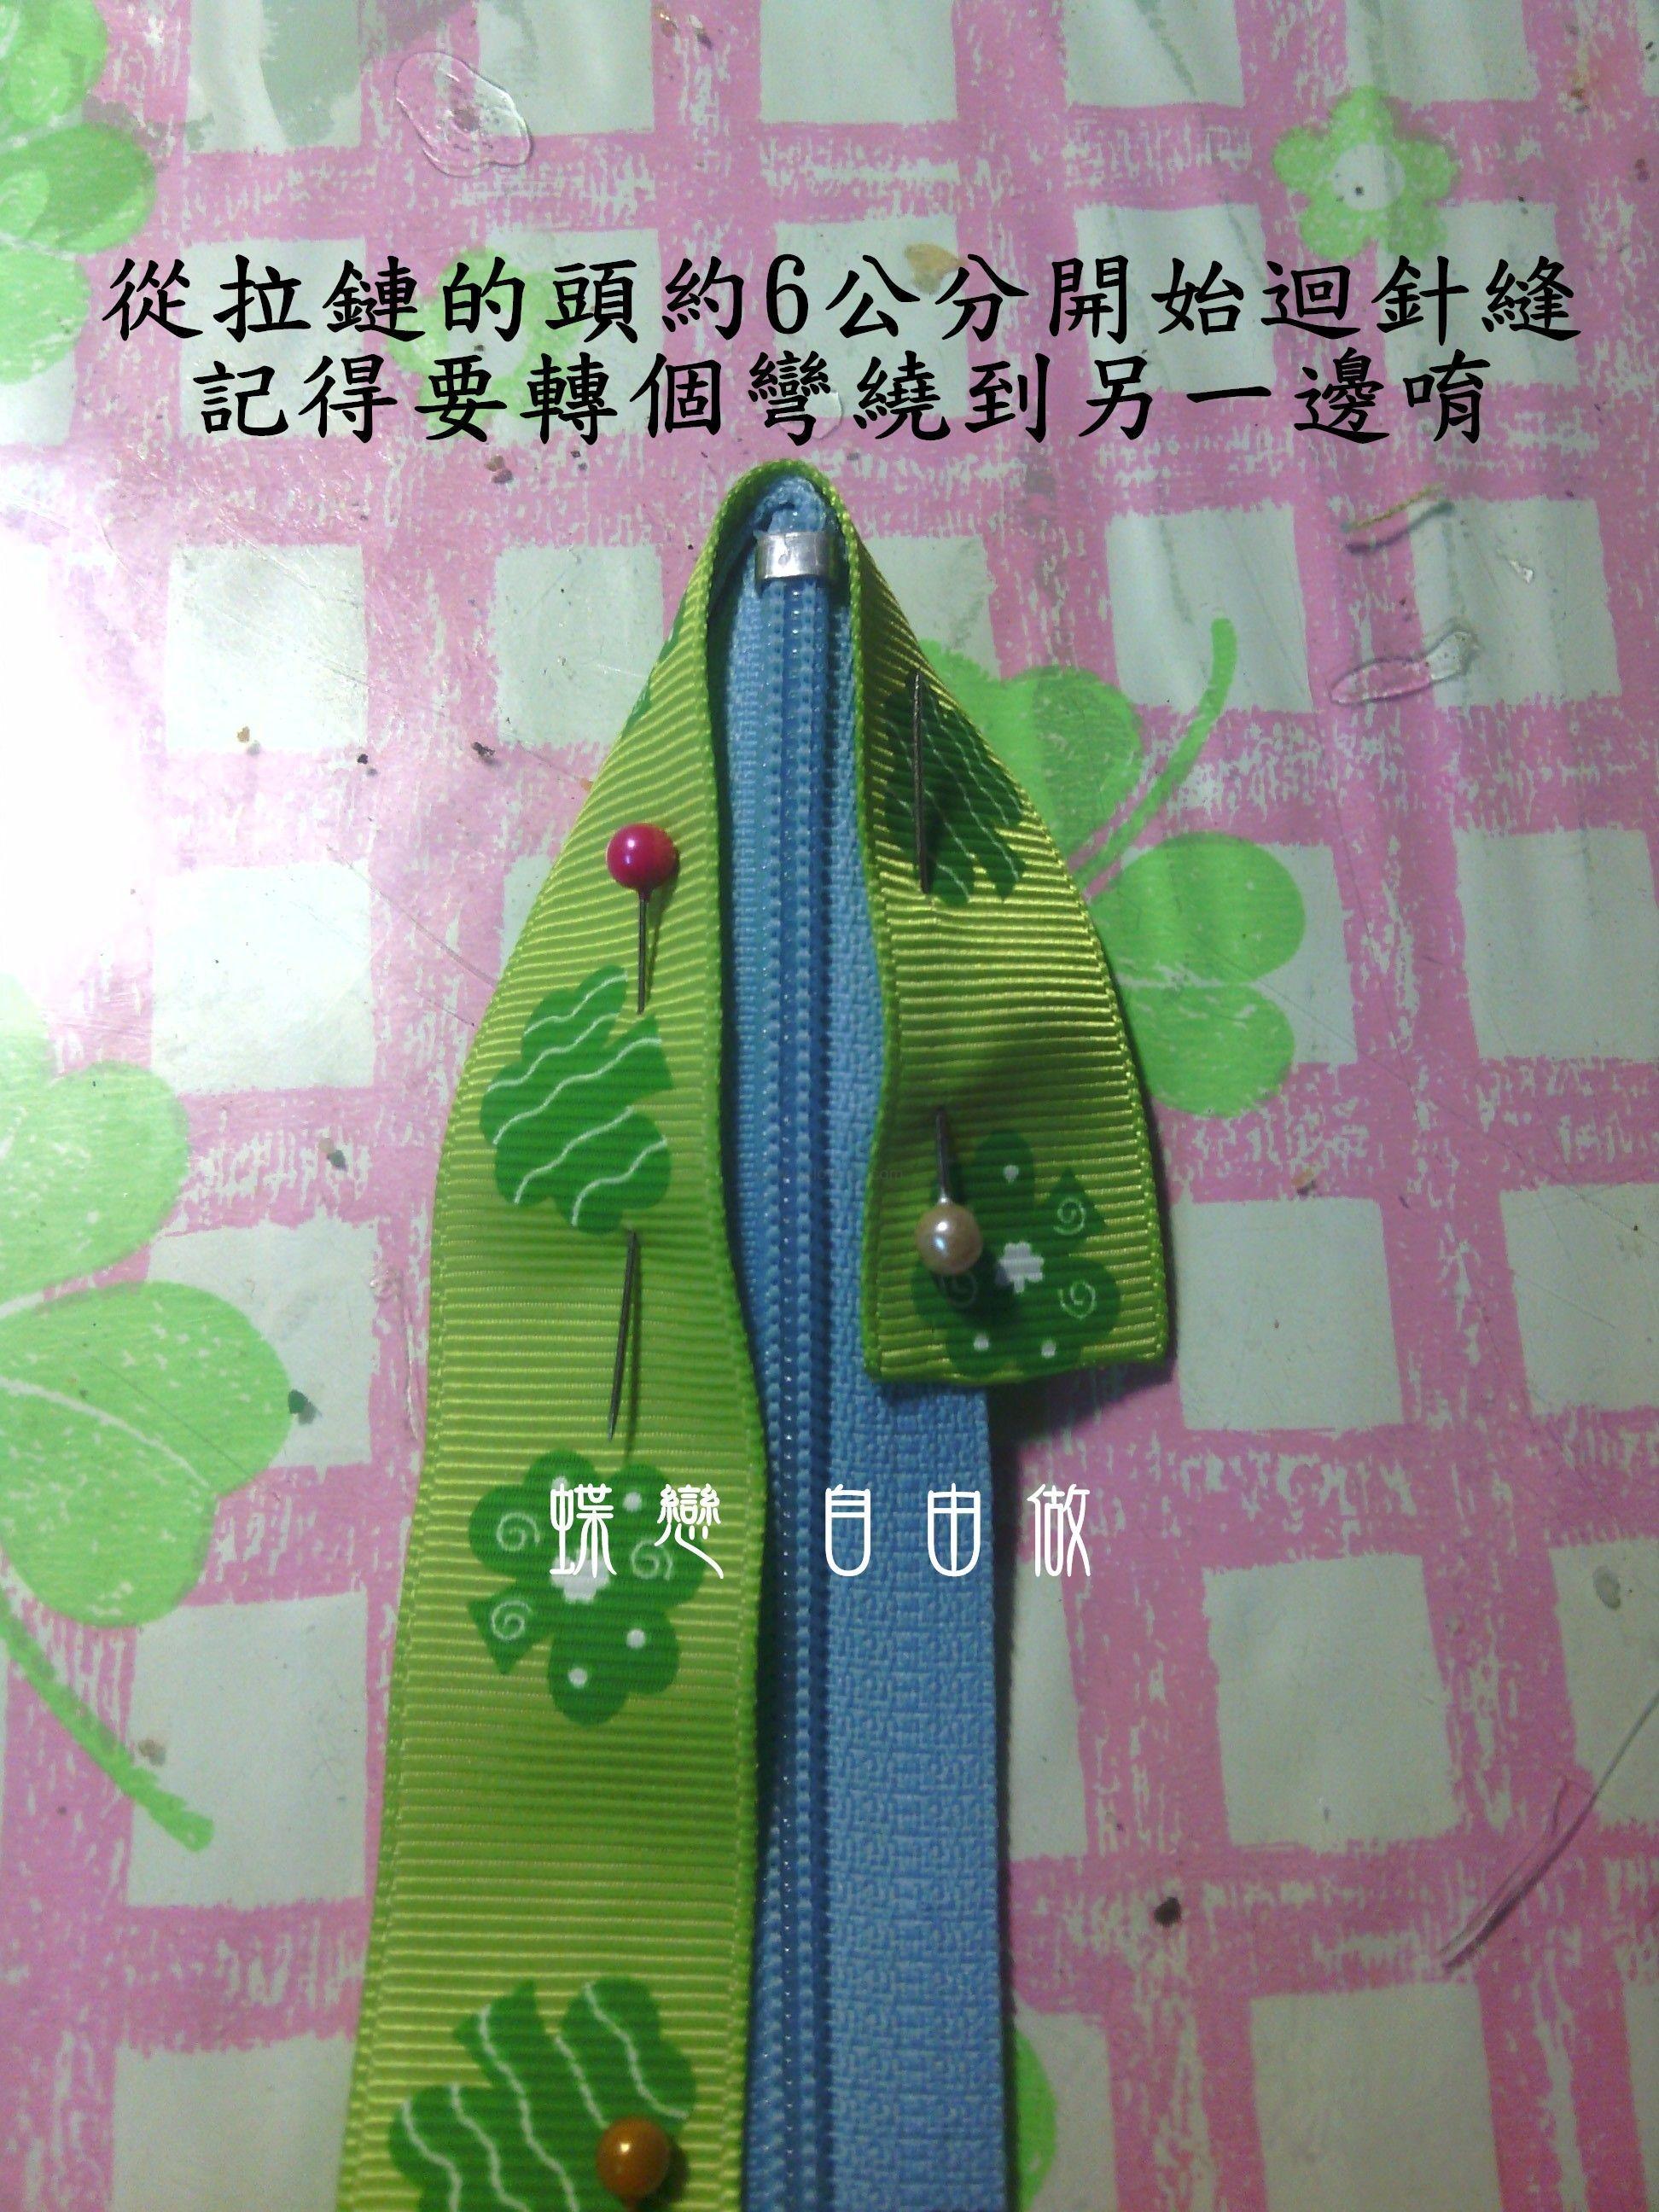 DIY 端午節手工肉粽造型零錢包教學 (2)